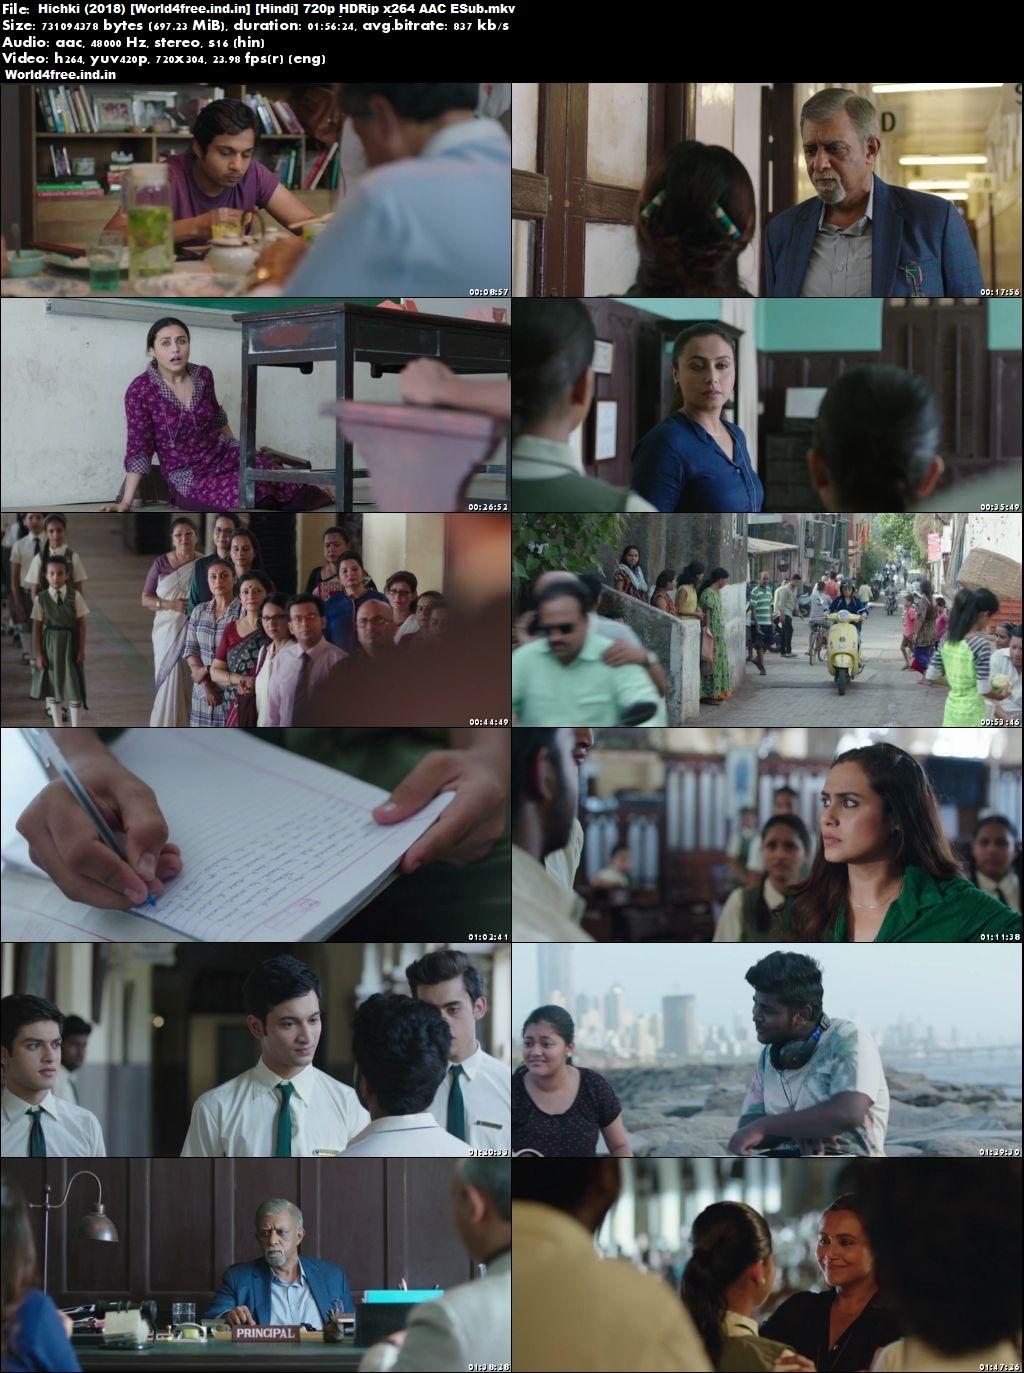 Hichki 2018 world4free.ind.in Full HDRip 720p Hindi Movie Download